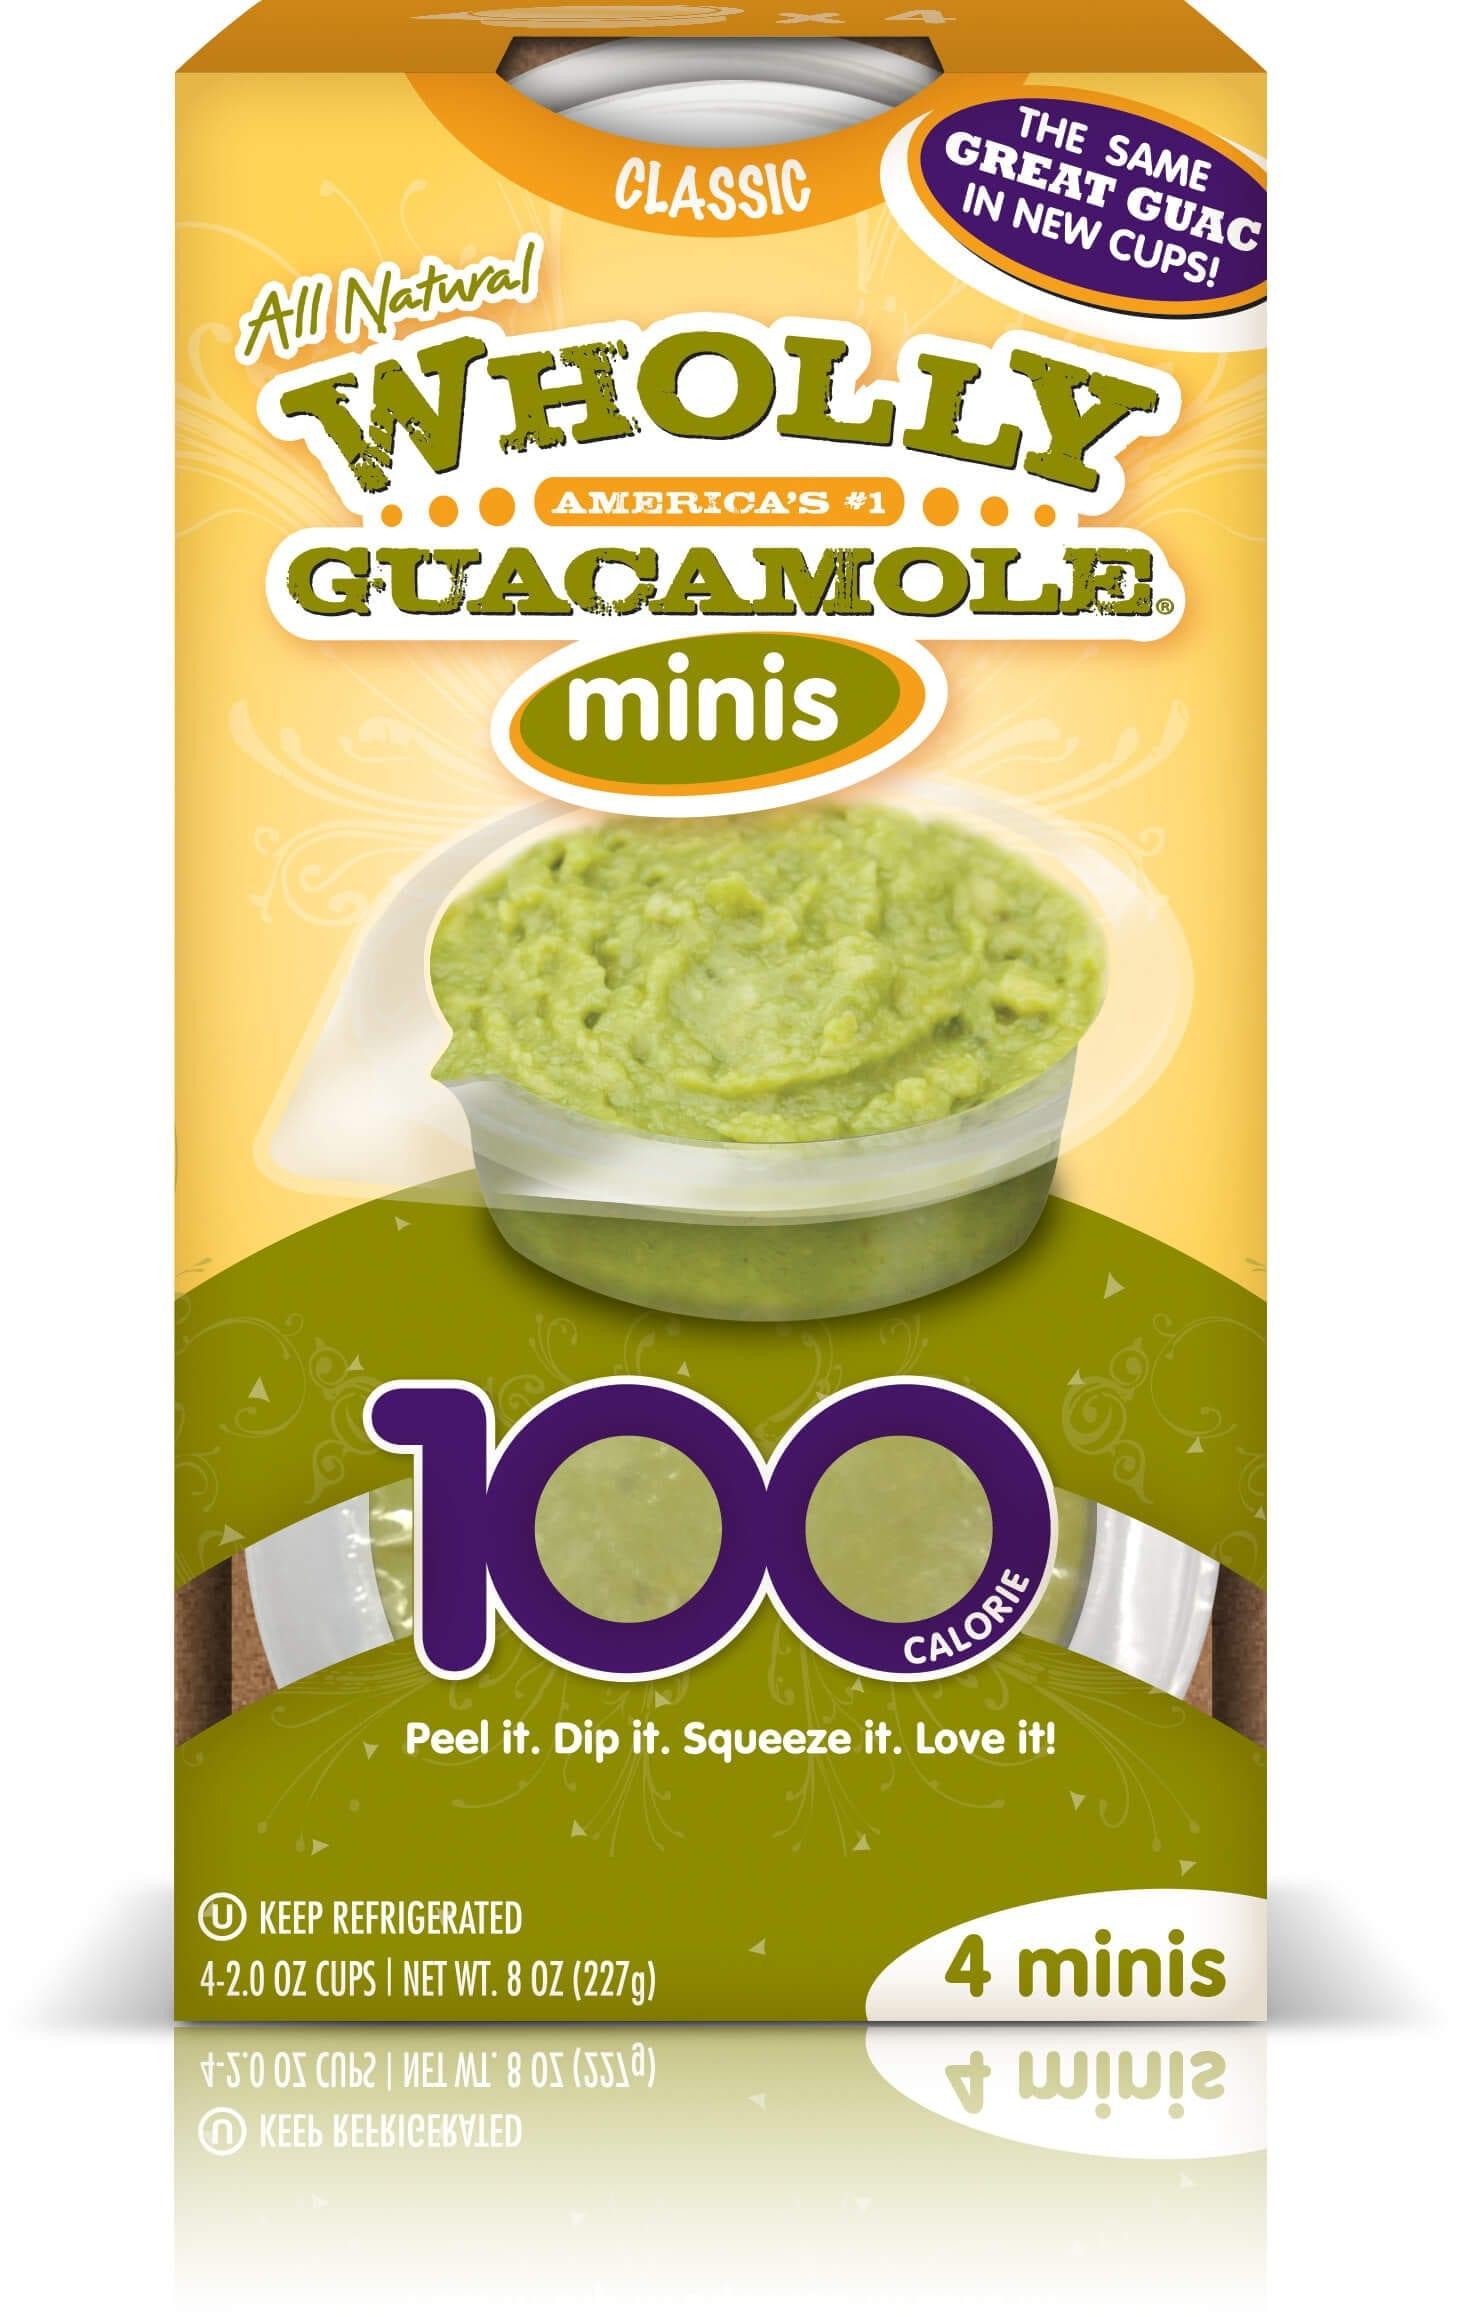 wholly guacamole avocado healthier snacks for the office